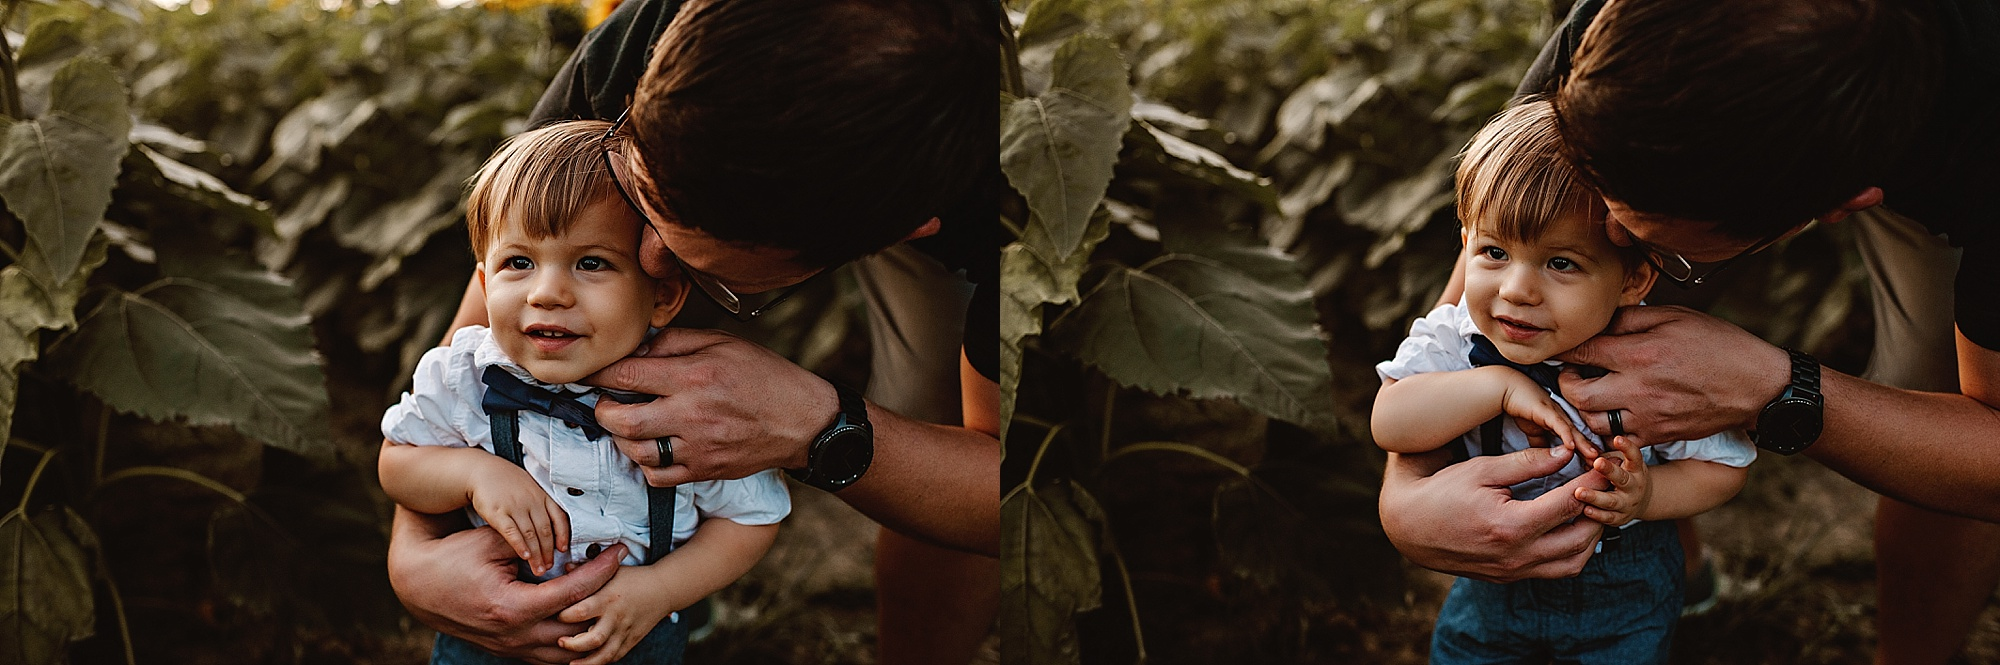 Schreiner-family-lauren-grayson-cleveland-photographer-sunflower-field-session_0008.jpg